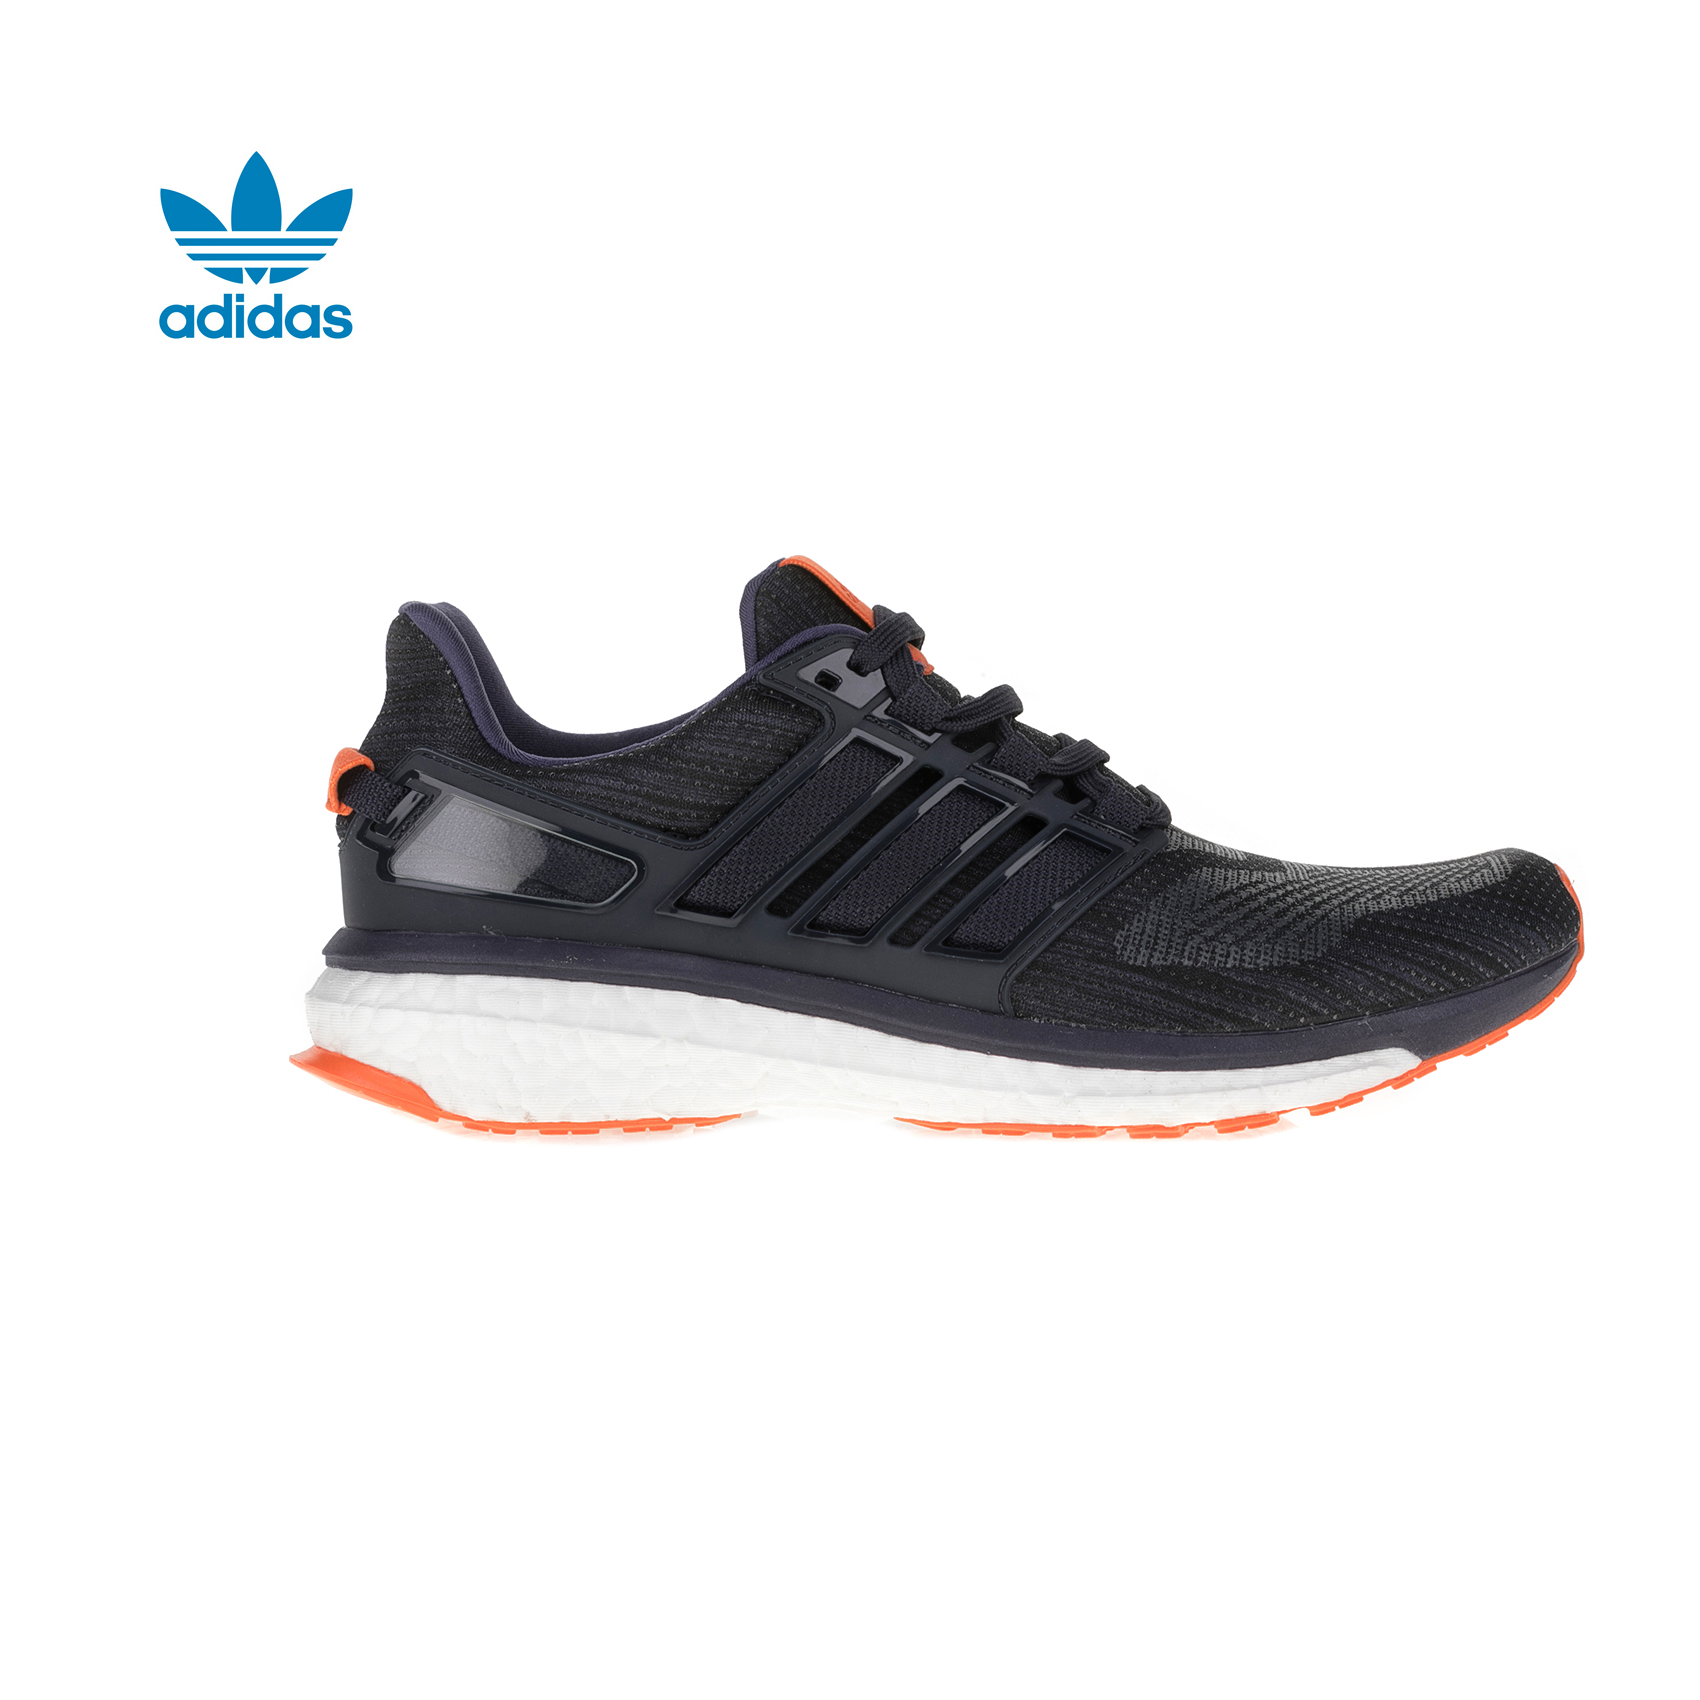 ADIDAS - Ανδρικά παπούτσια adidas energy boost 3 μαύρα ανδρικά παπούτσια αθλητικά running